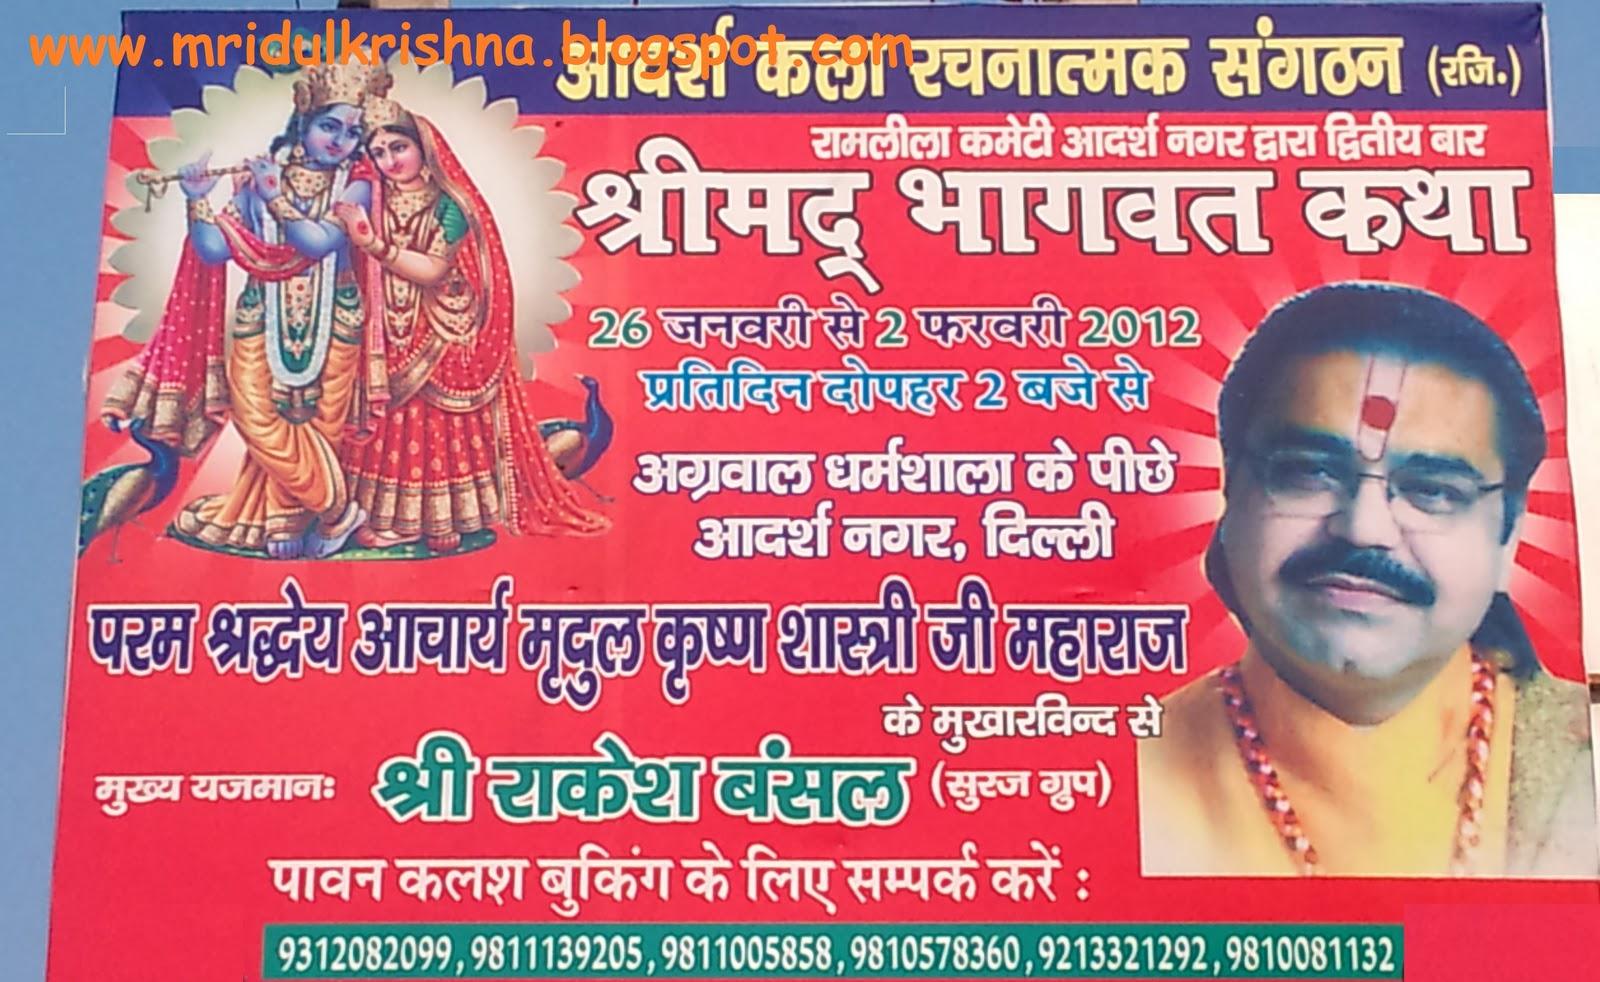 Bhagwat Katha Wallpaper Shrimad Bhagwat Katha at